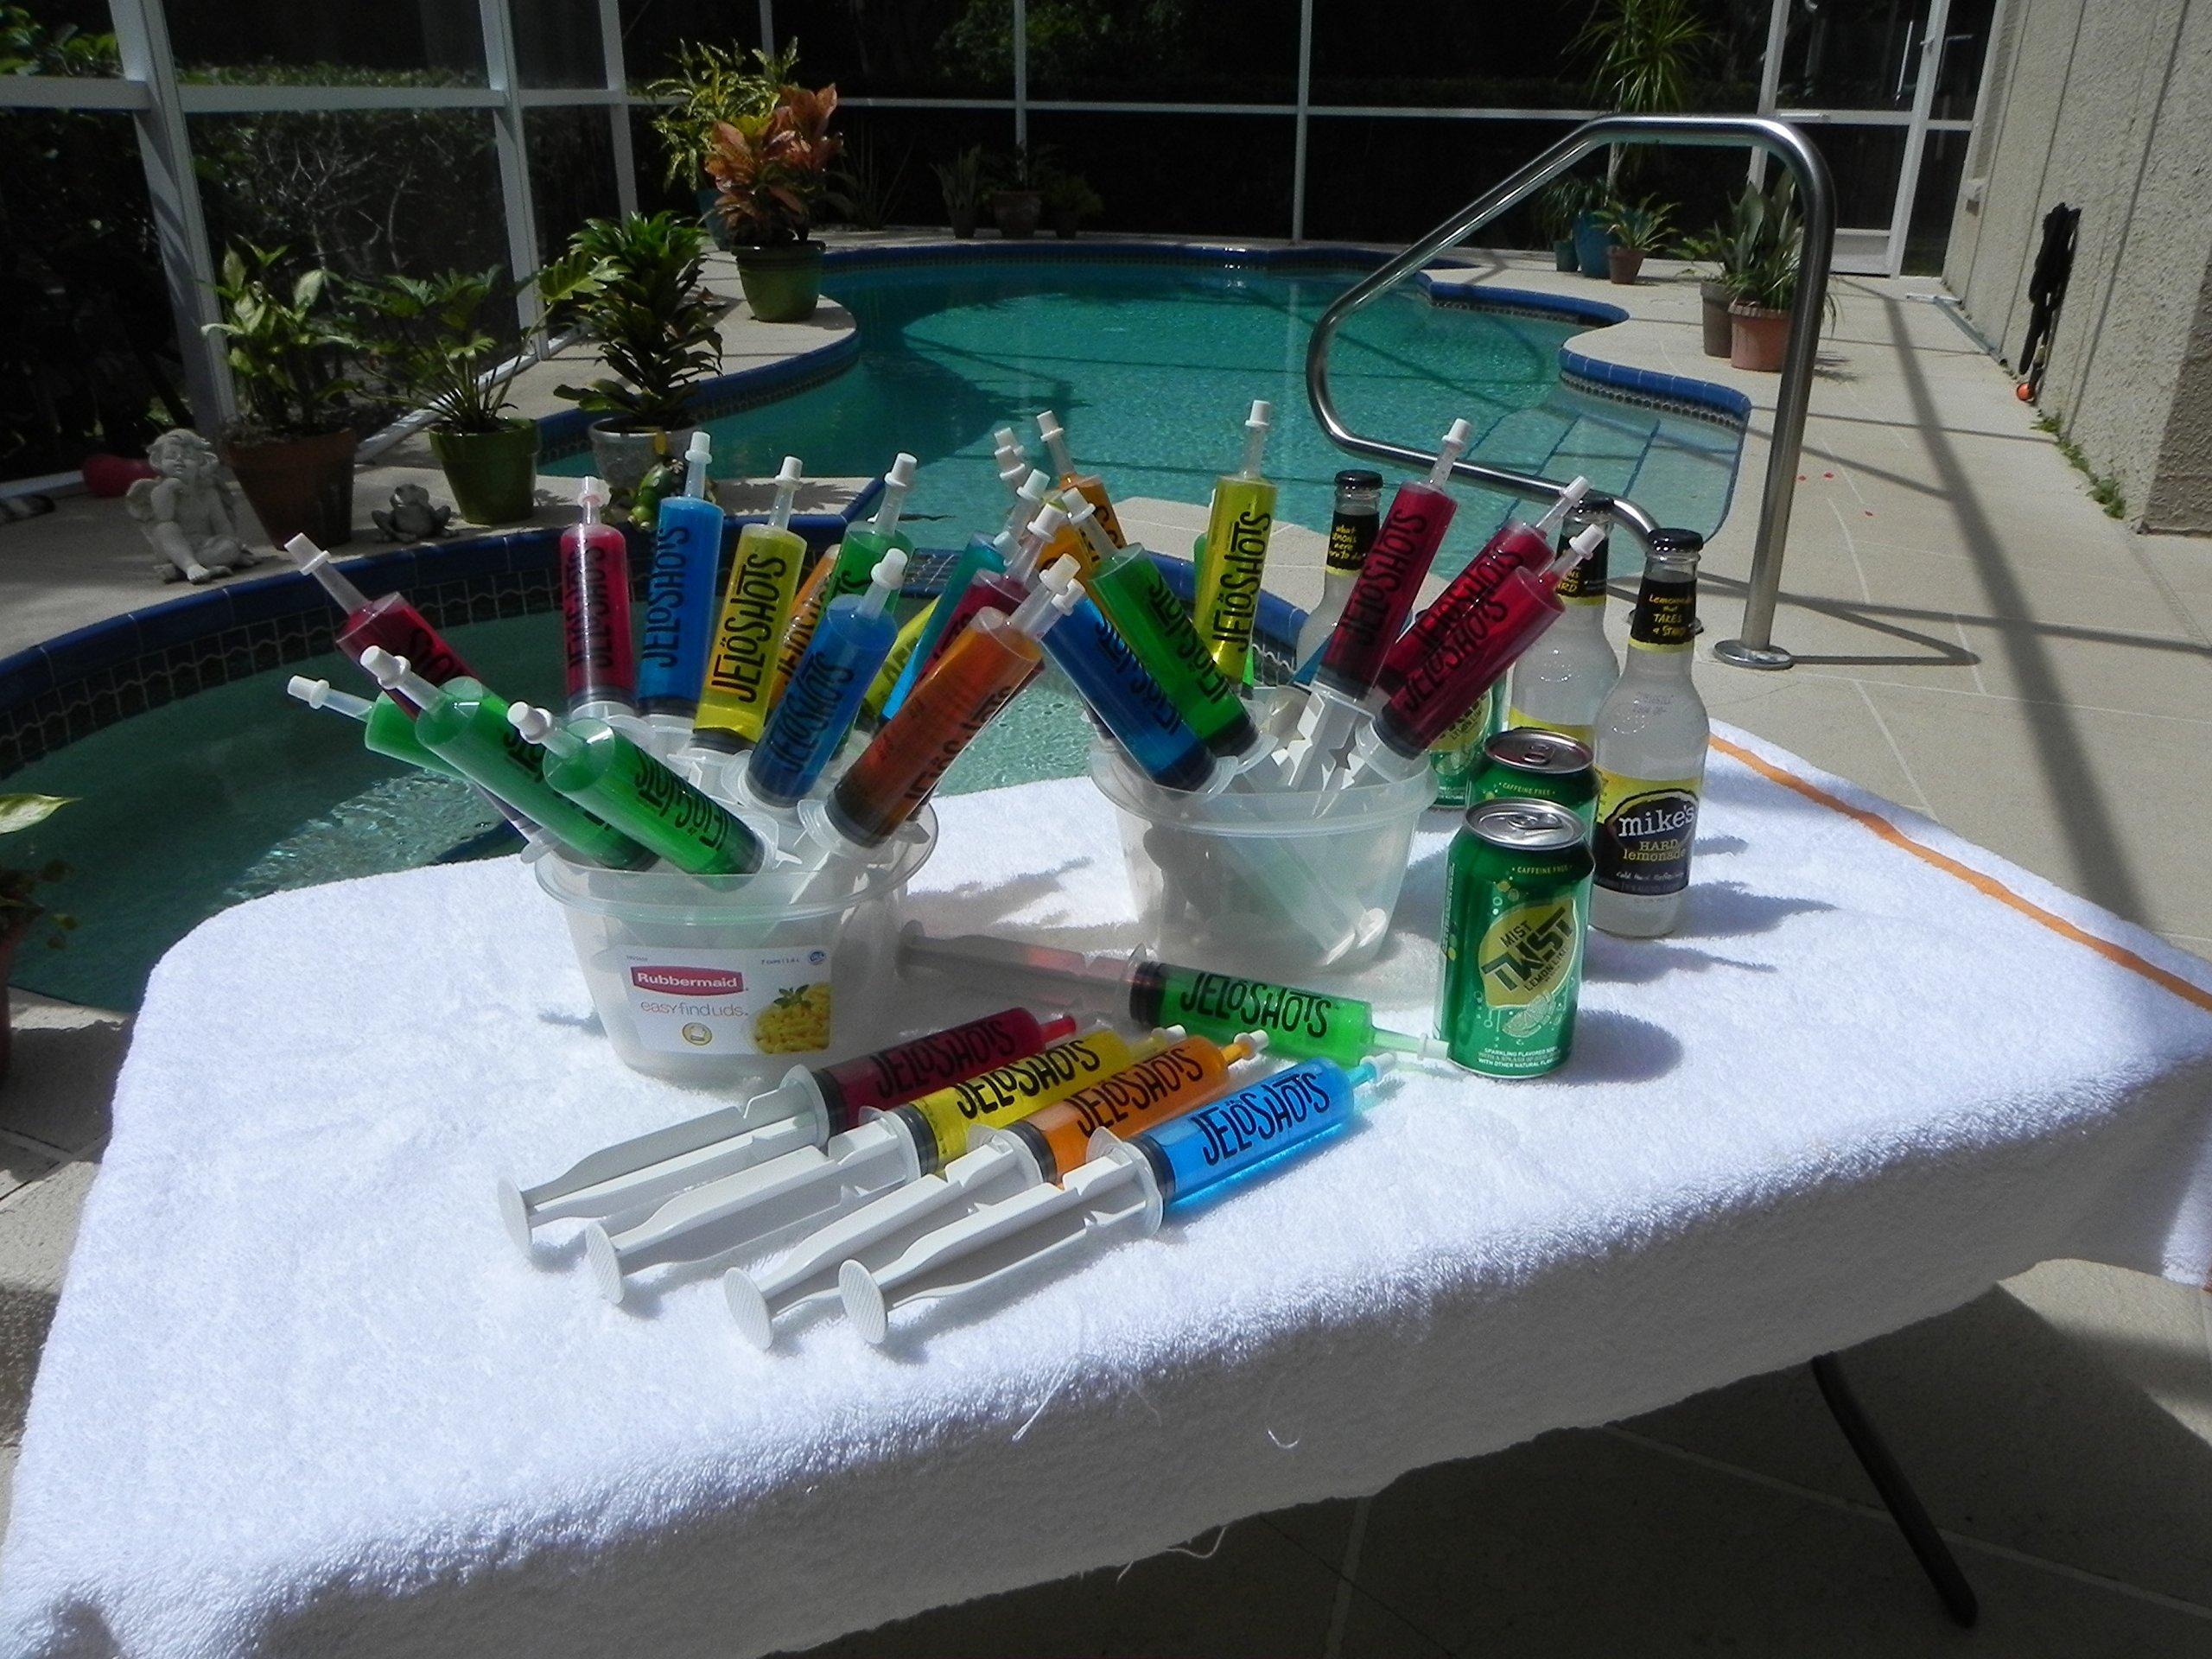 Jello Shot Syringes 32-Pack, Medium (up to 2oz), The Original JeloShots Gelatin Jello Shot Syringes with Easy-Grip Caps, Reusable by The Original JeloShots (Image #7)